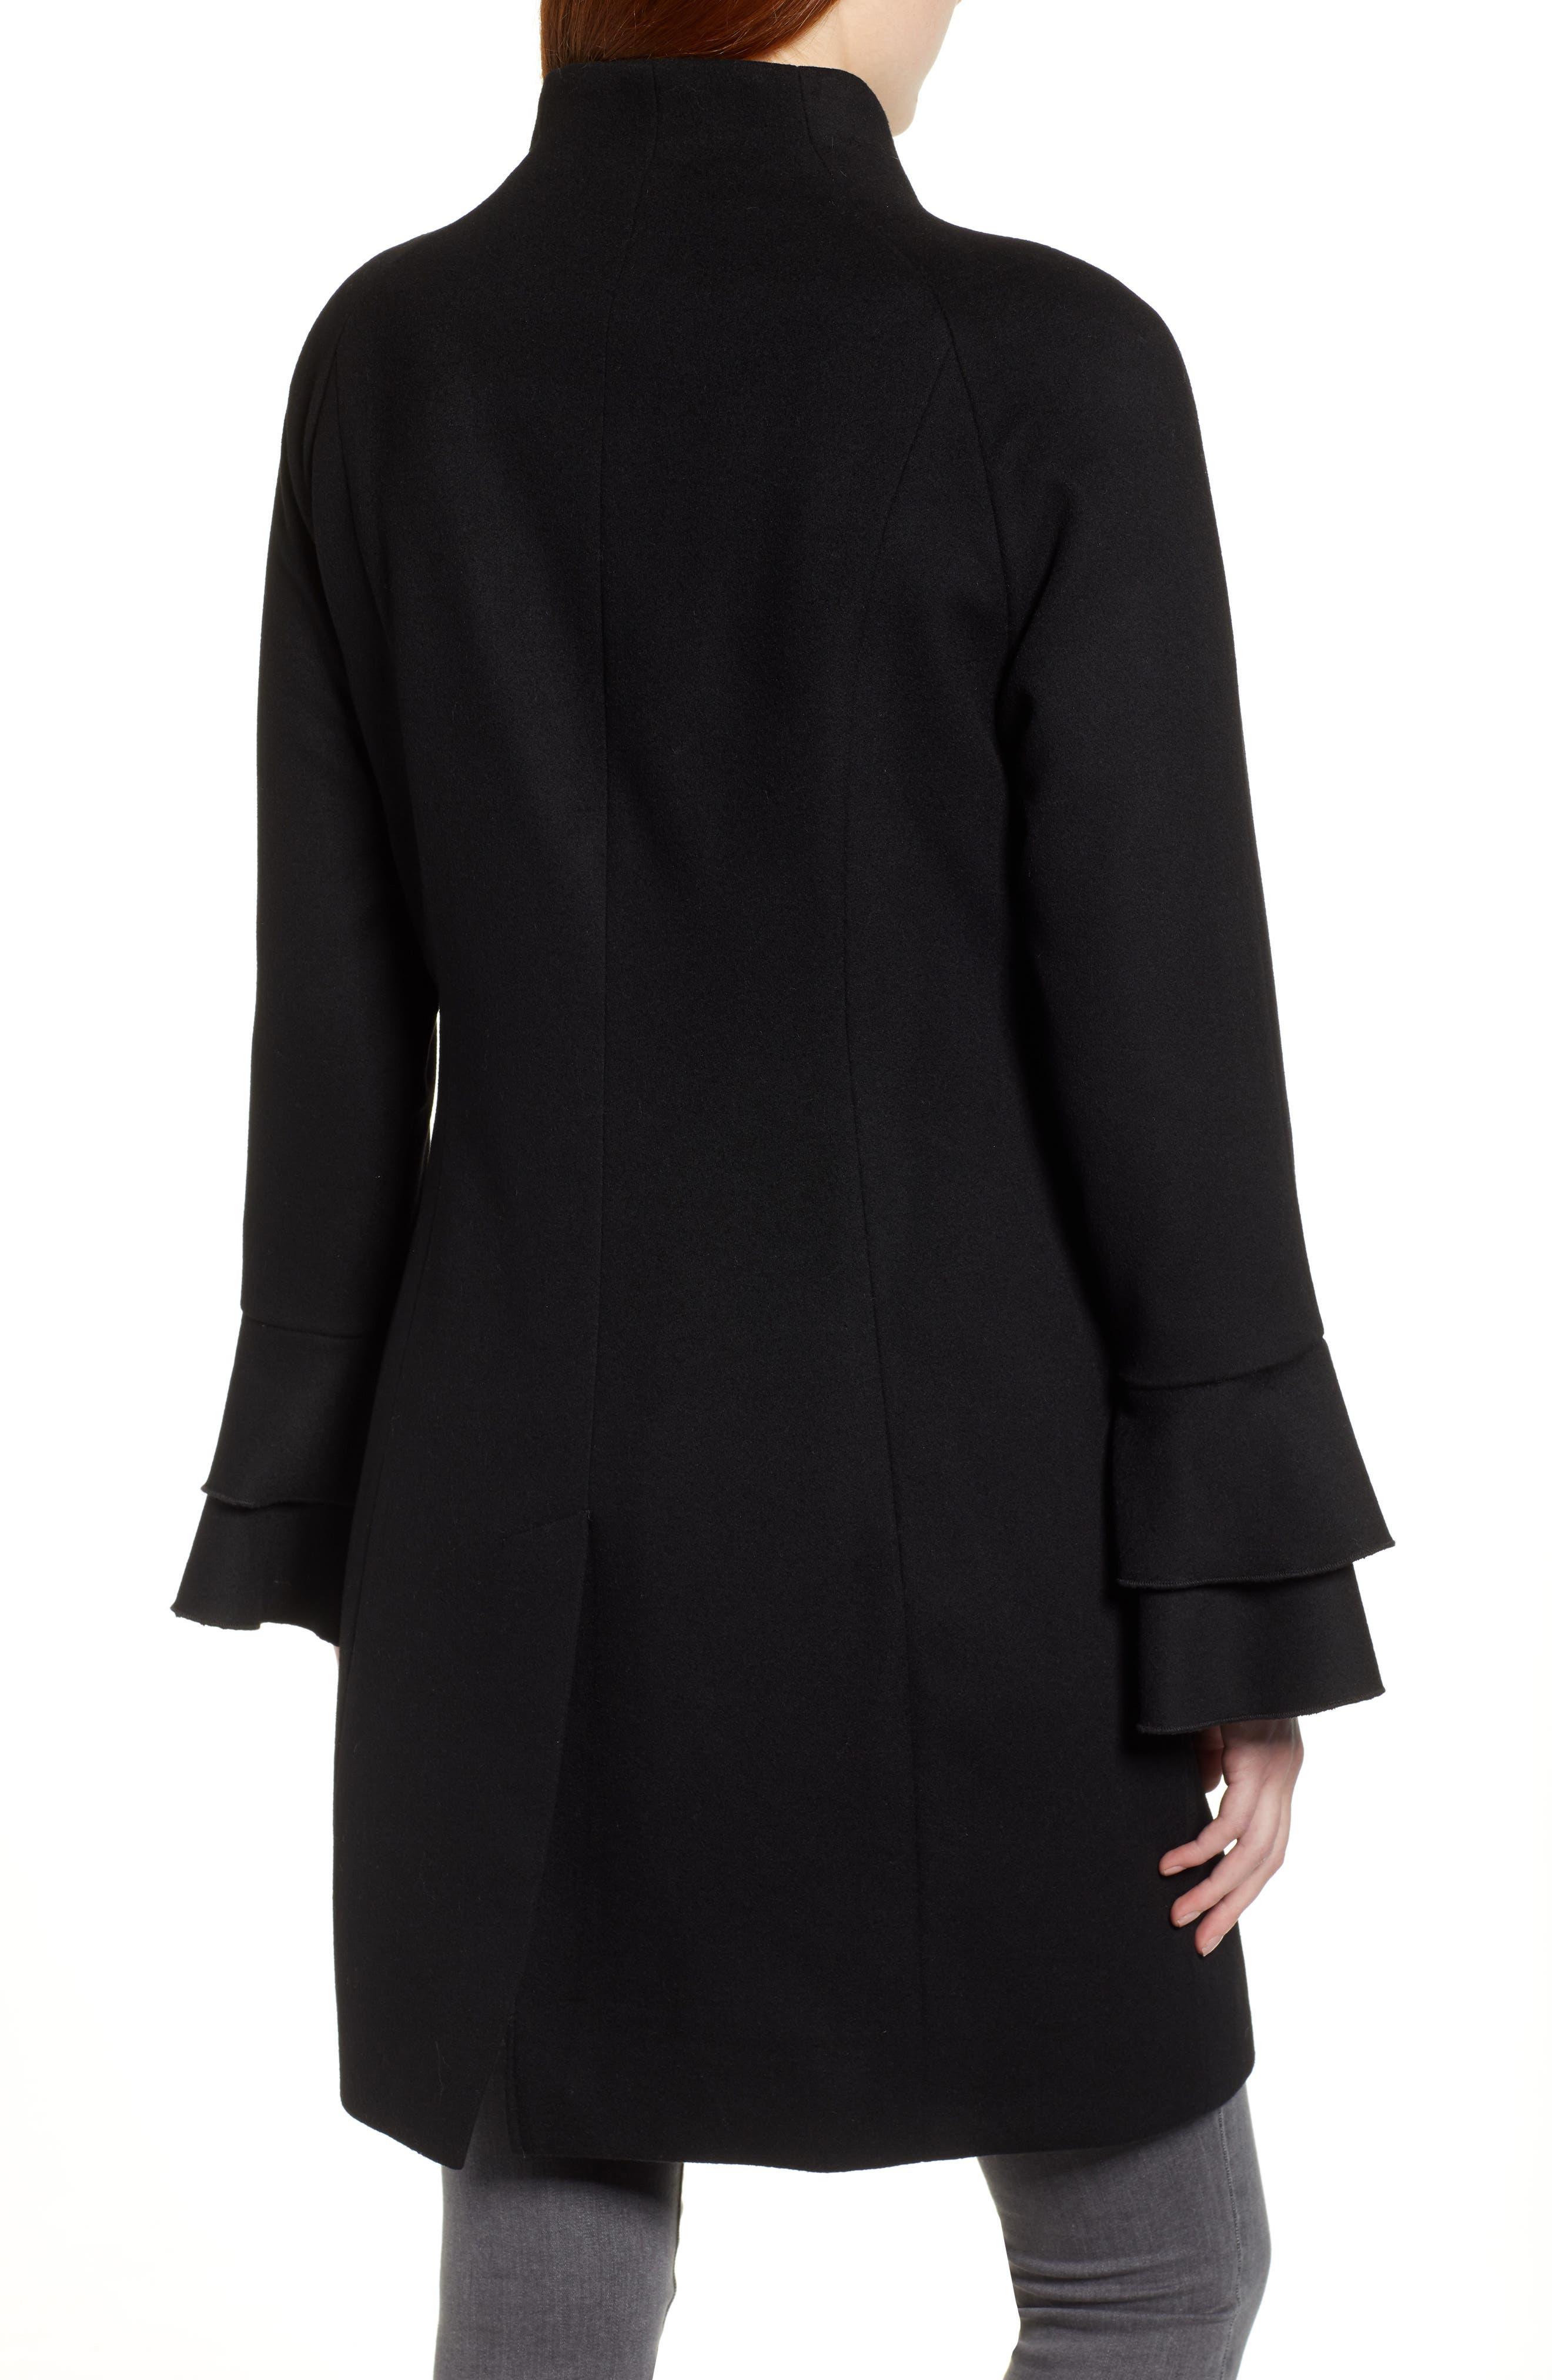 TRINA TURK,                             Sara Ruffle Cuff Wool Blend Coat,                             Alternate thumbnail 2, color,                             001